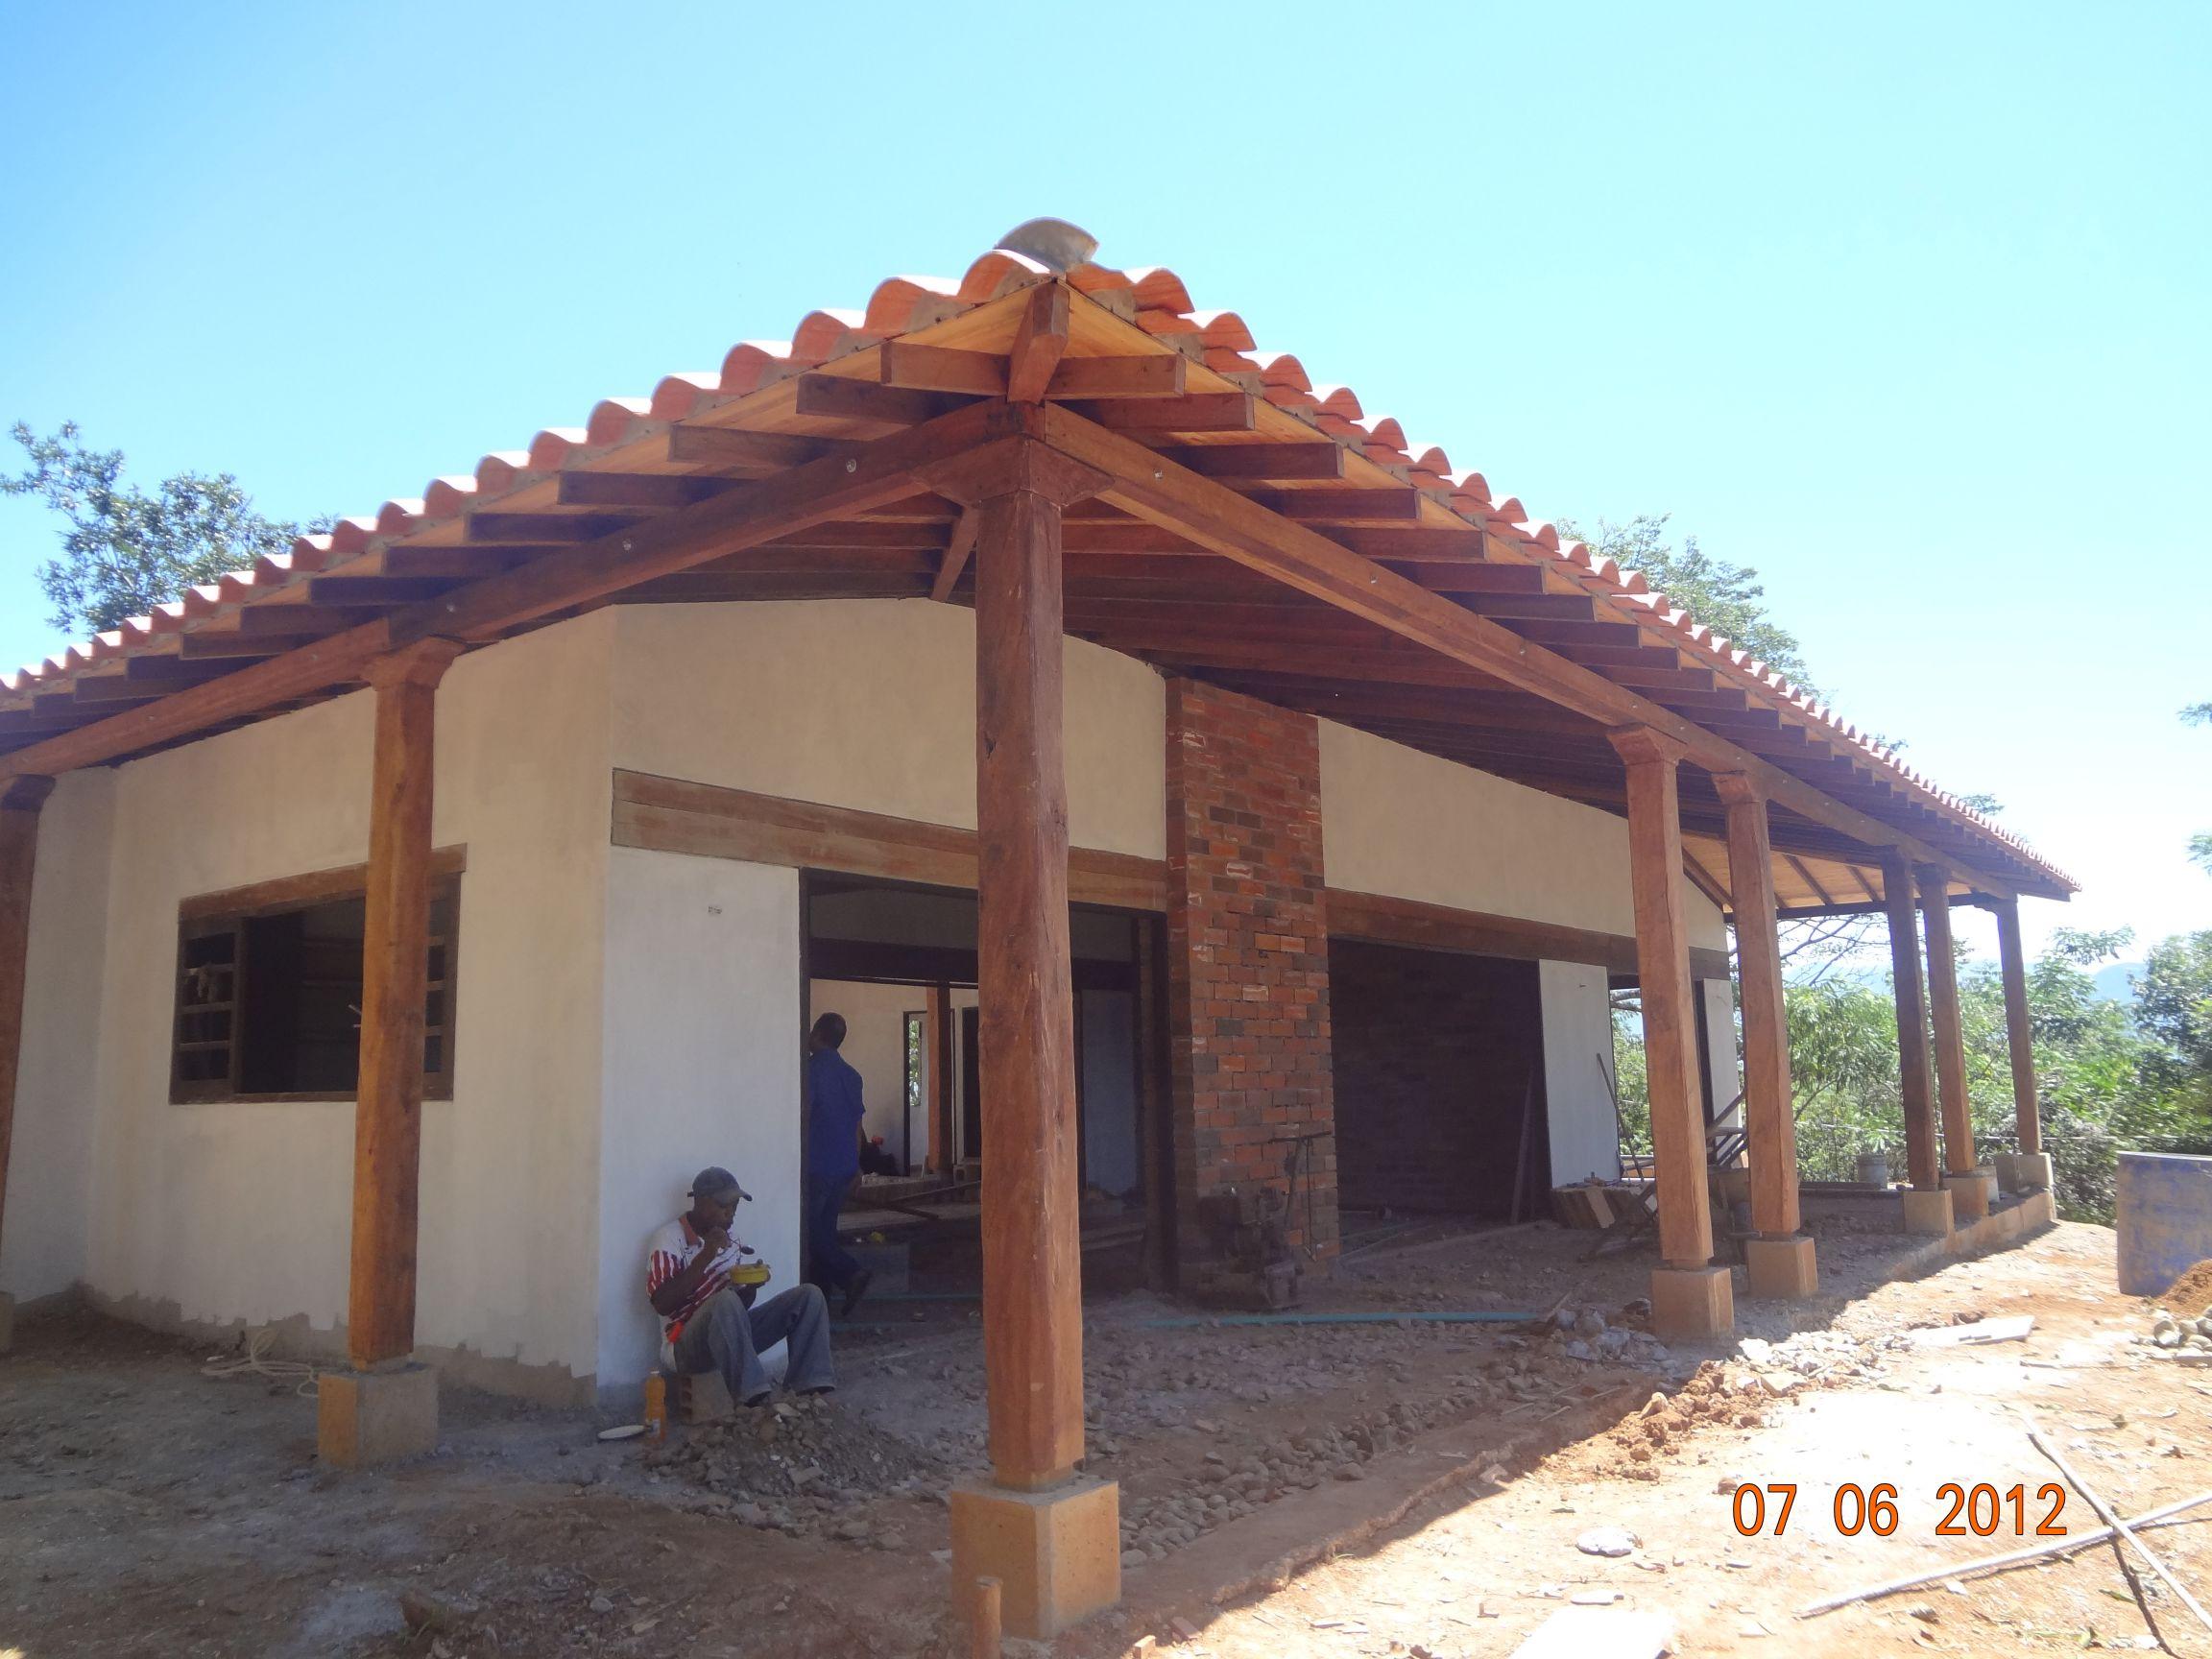 Casas prefabricadas madera venta casa prefabricadas - Casas prefabricadas en navarra ...